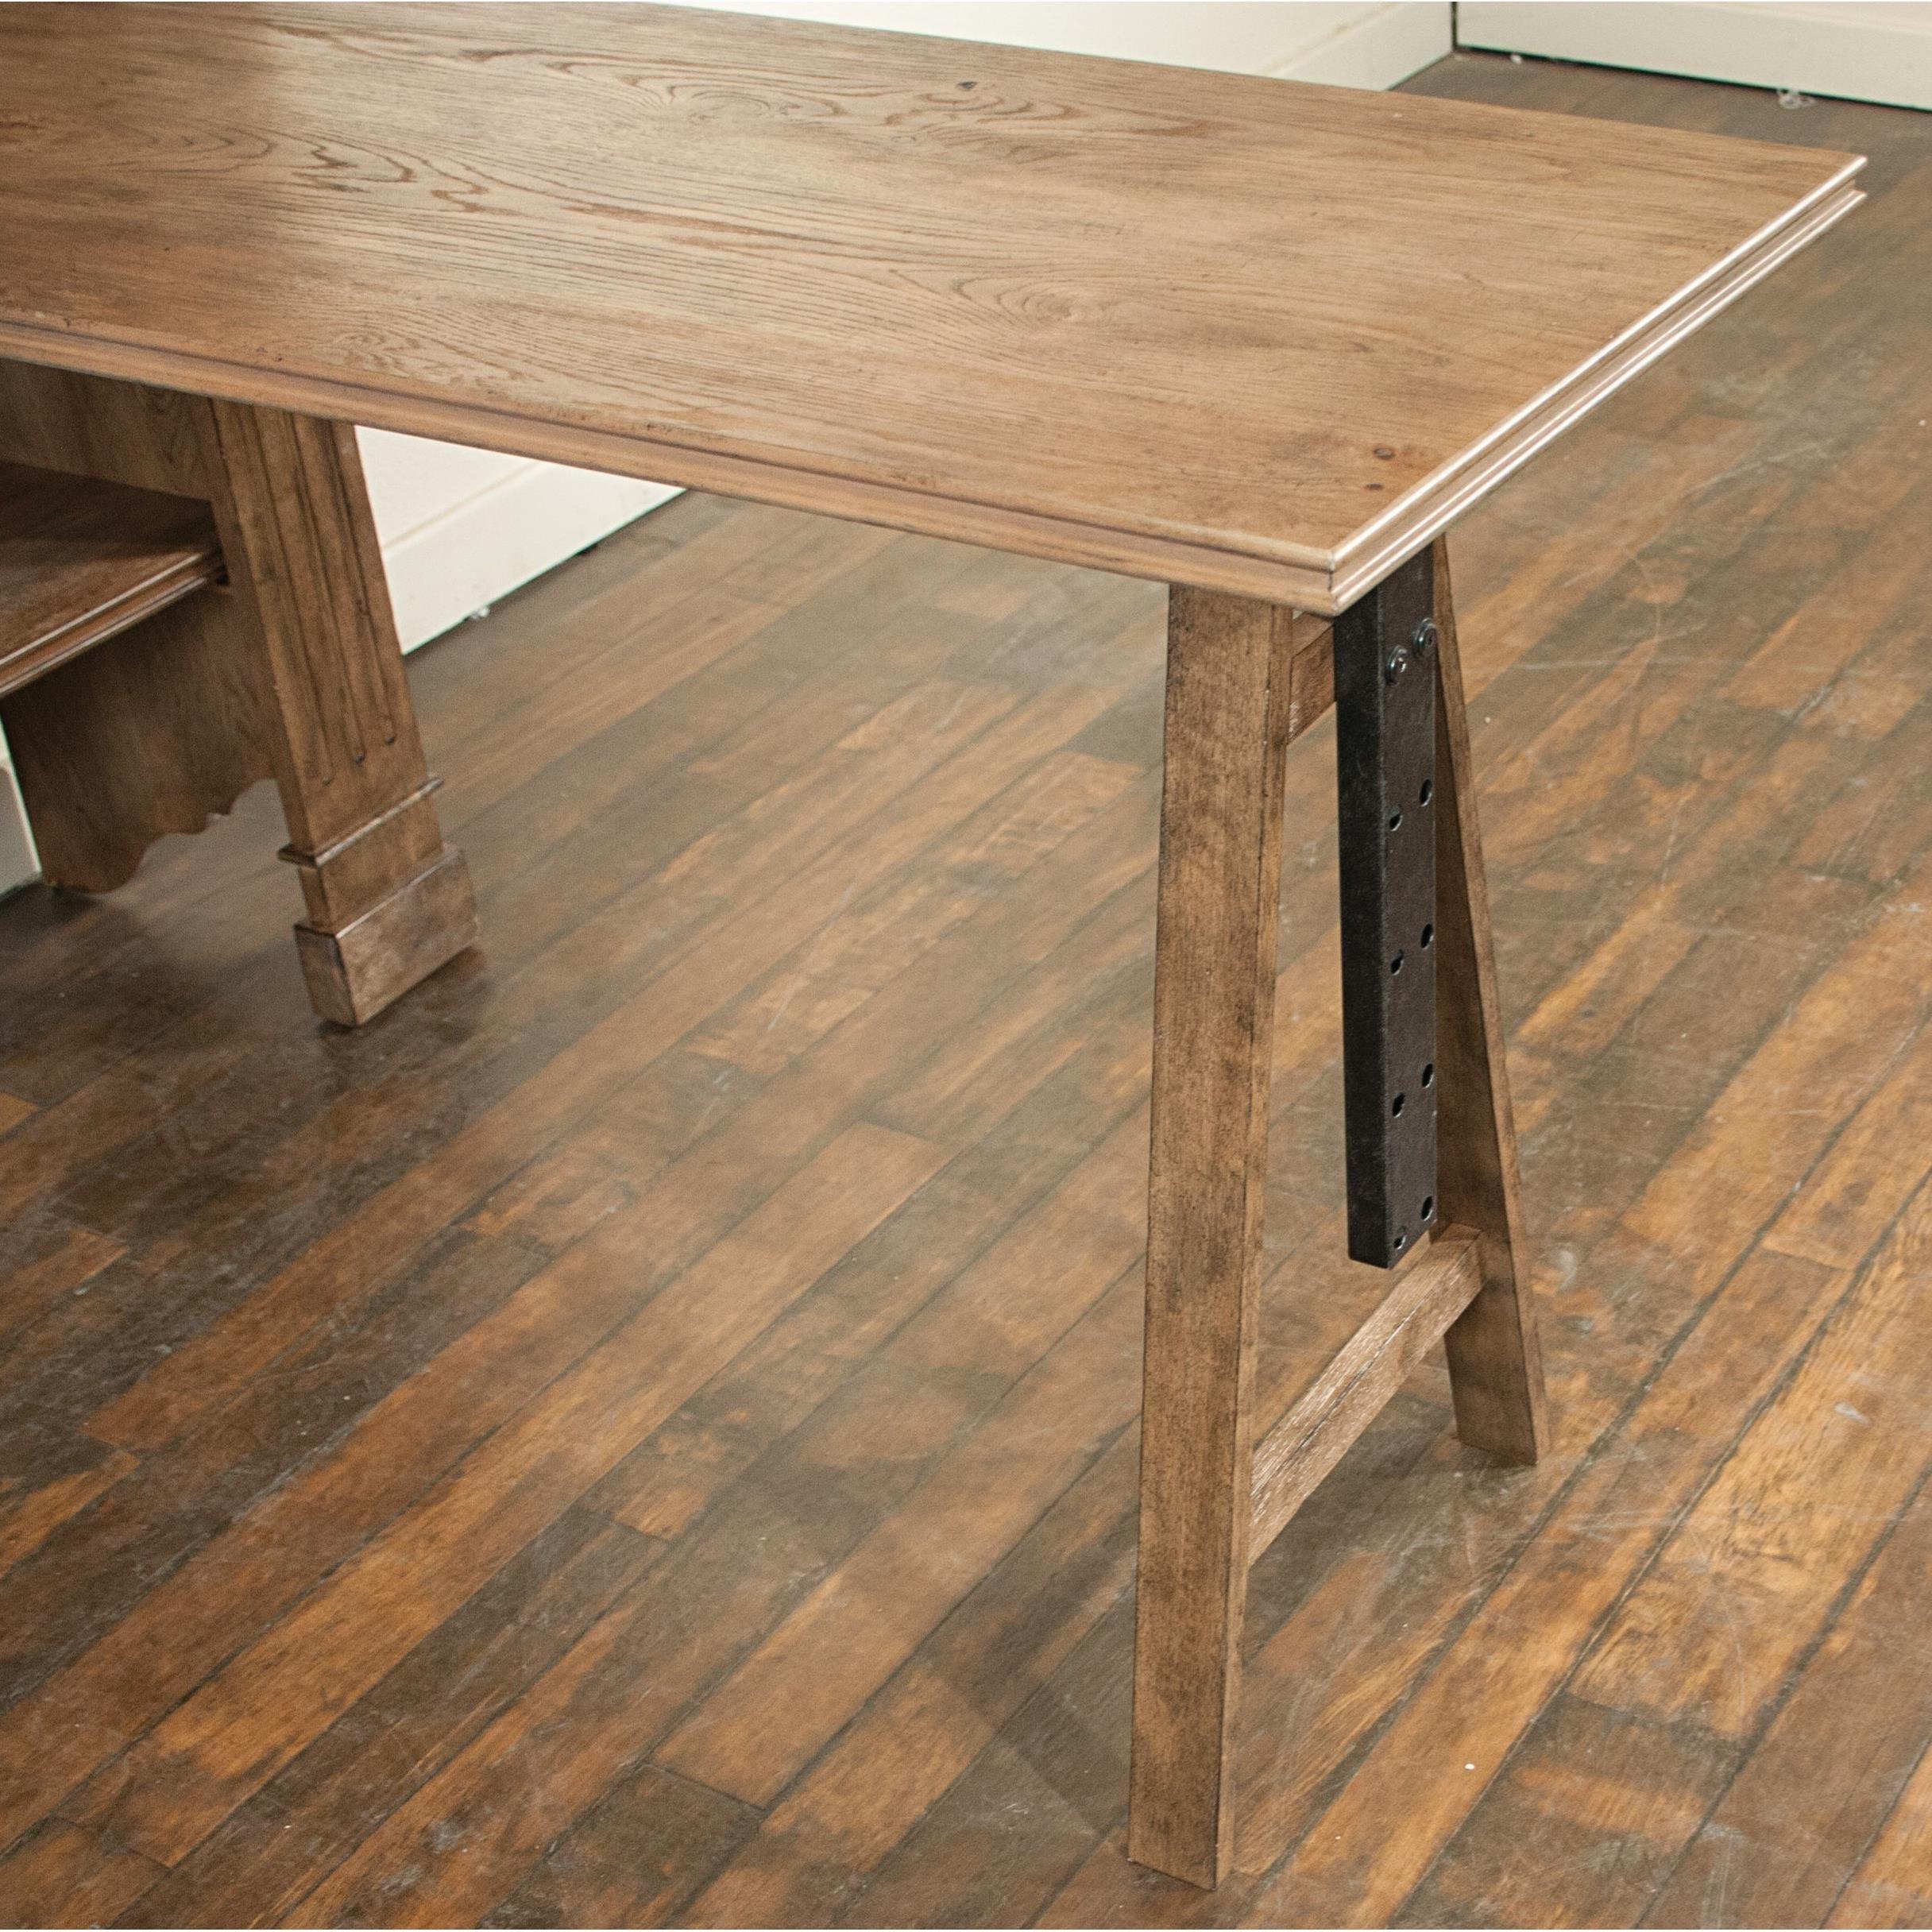 Riverside furniture northcote 13433 adjustable desk in for Mackinzie craft room table